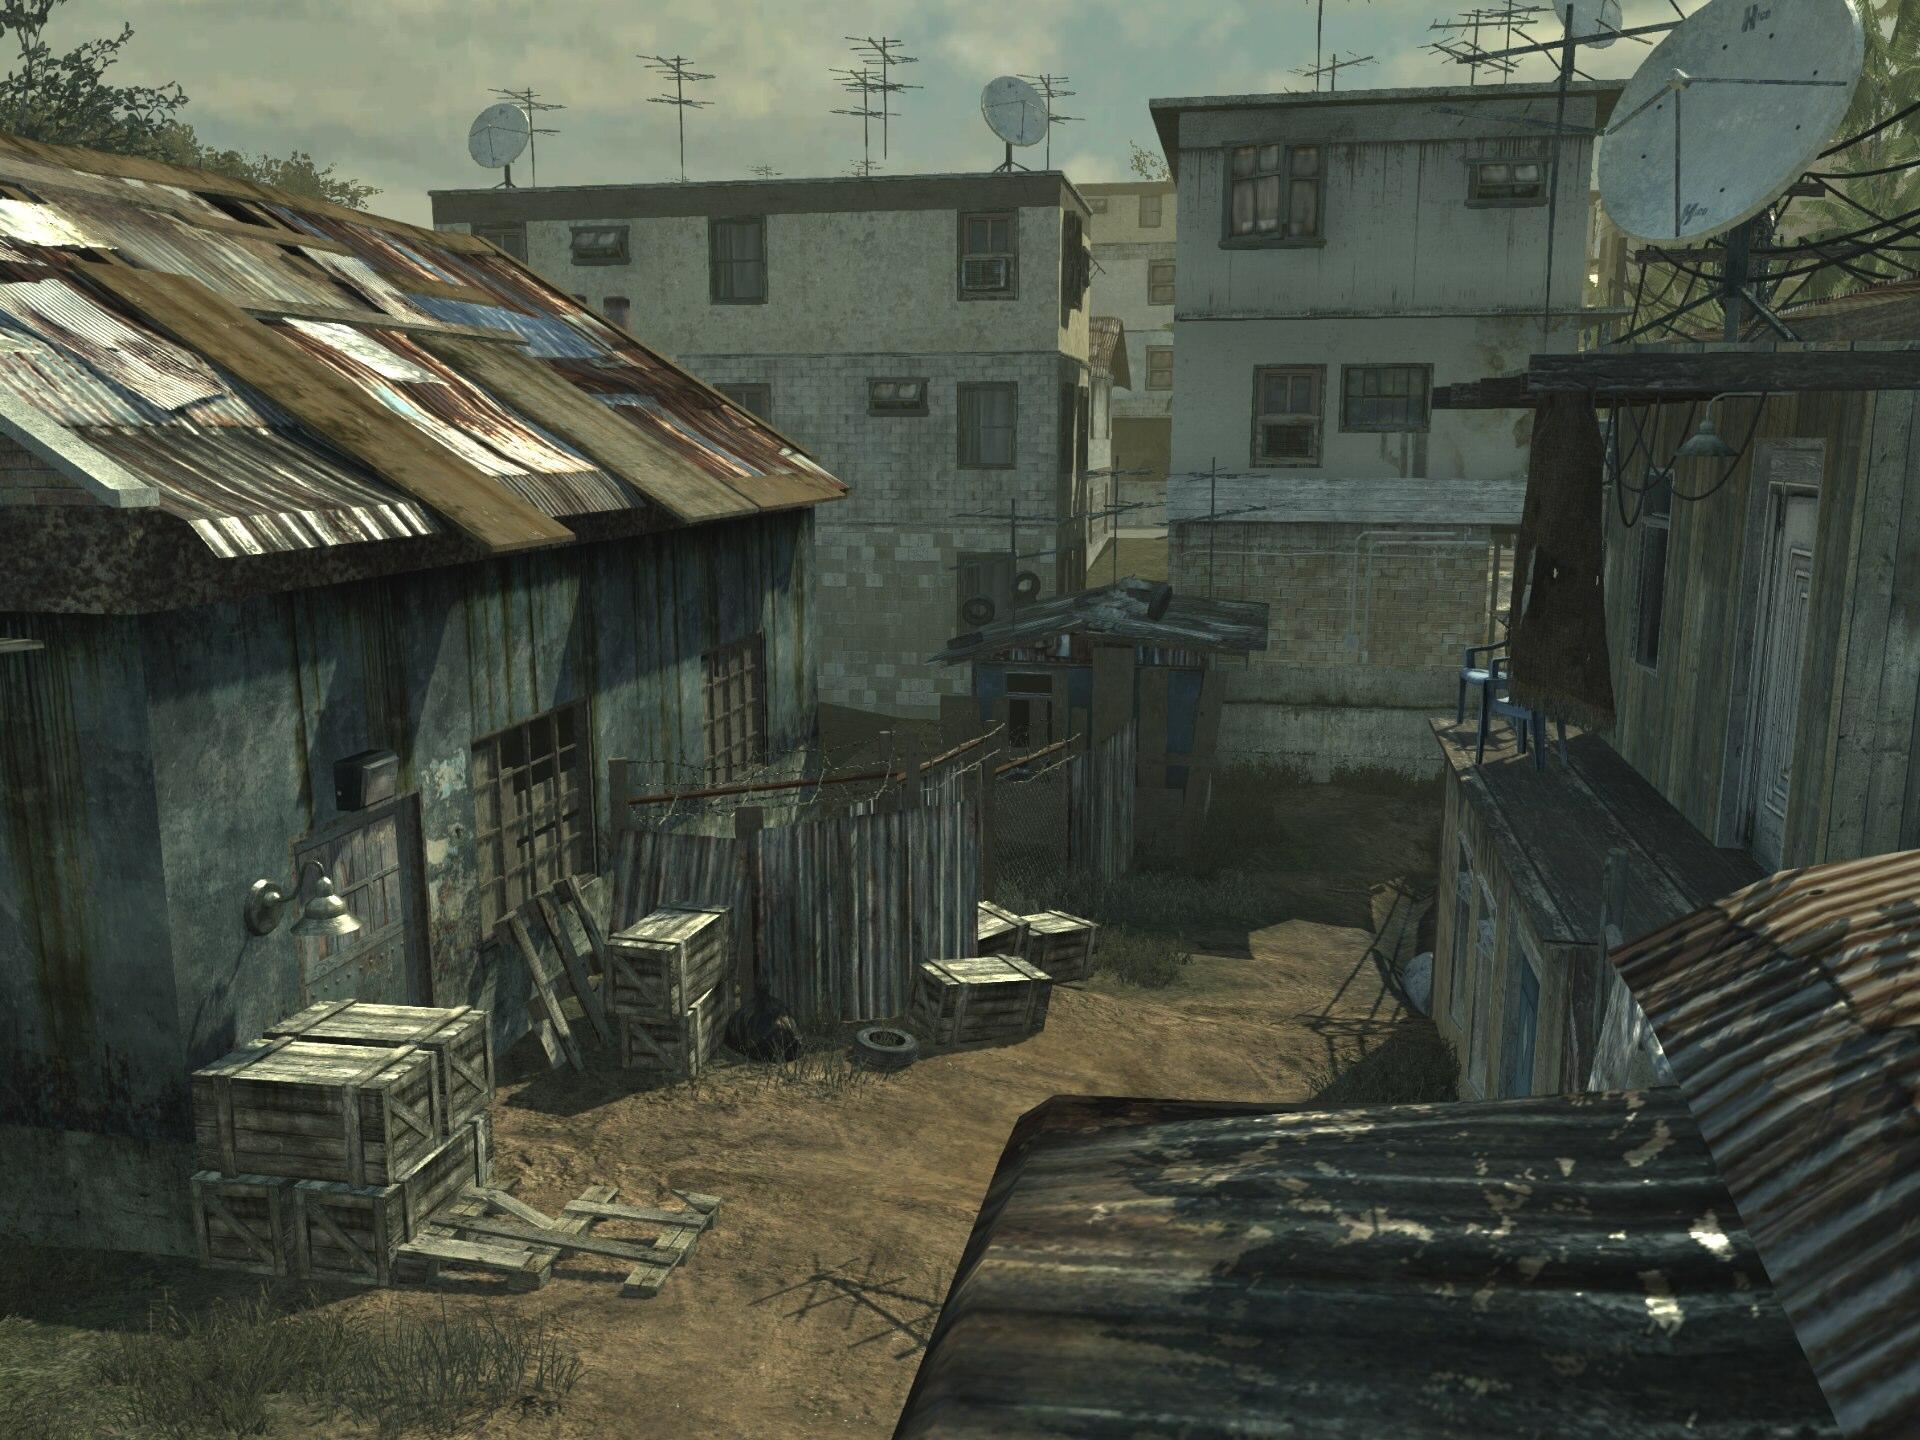 Image Park Resistance Mw3 Jpg Call Of Duty Wiki - Www imagez co